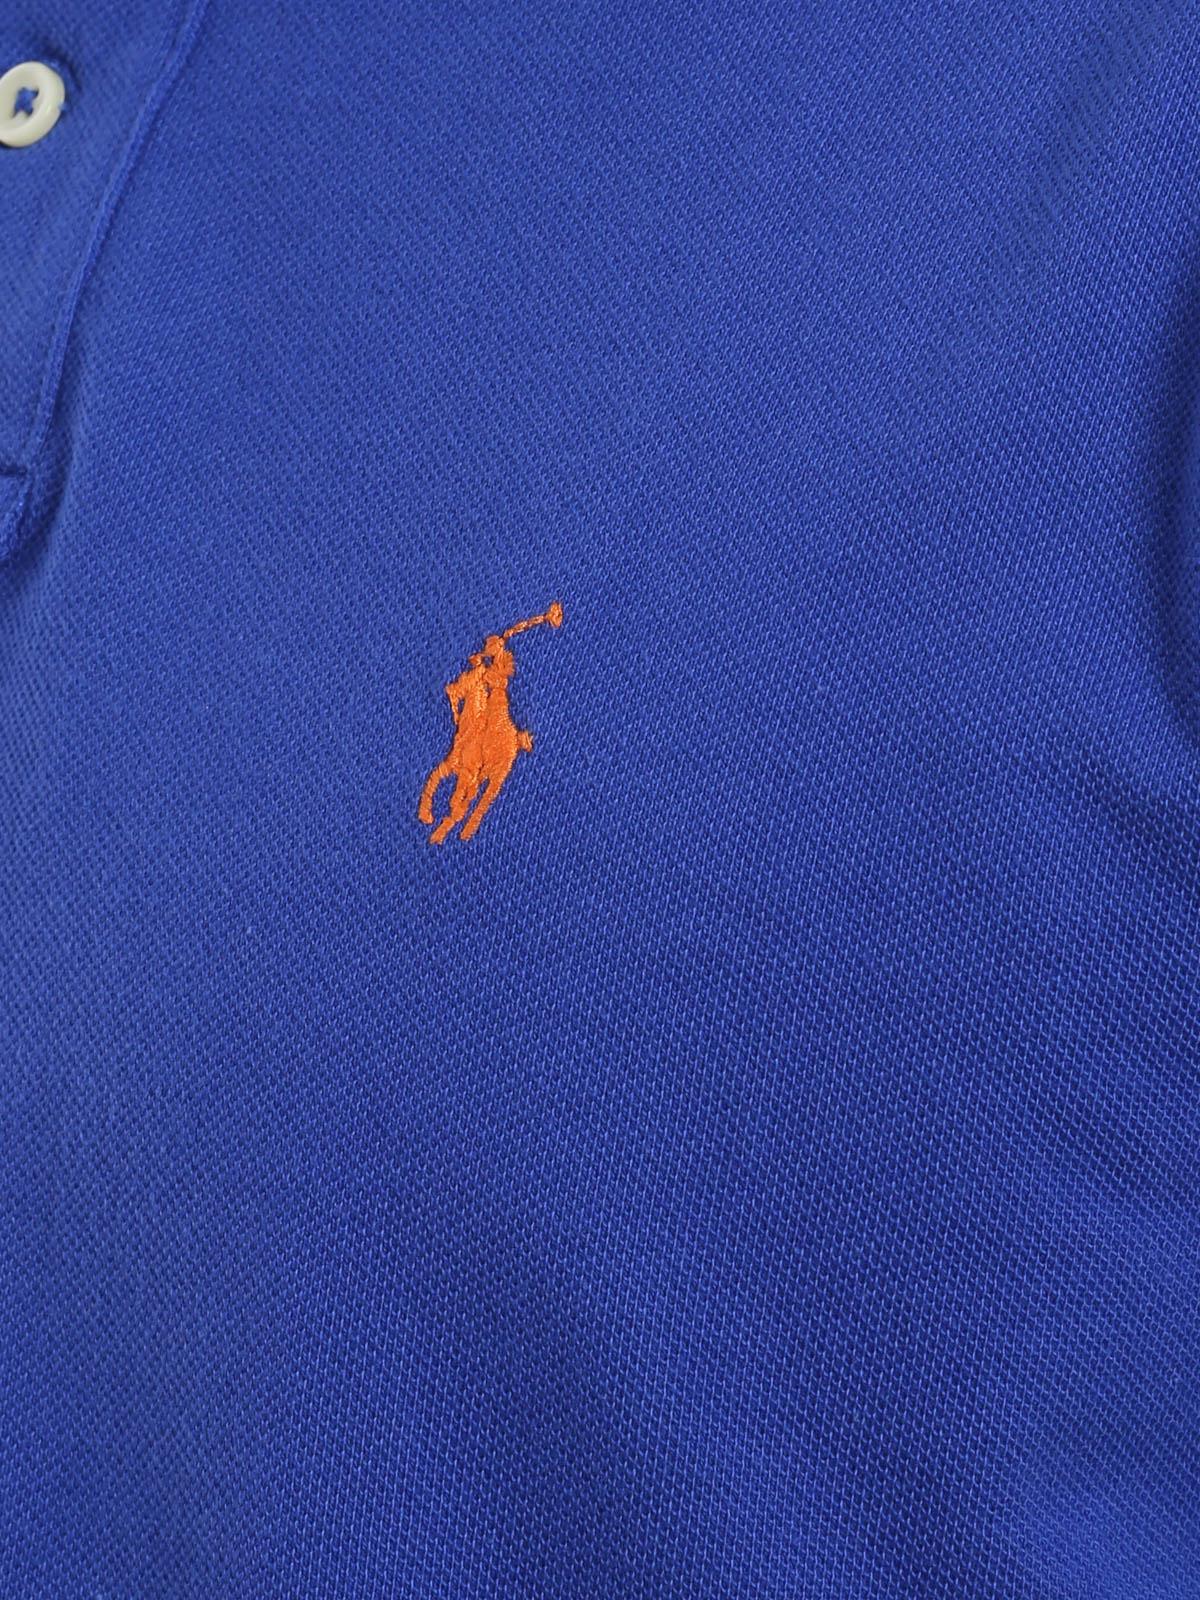 buy online c3c41 15765 Polo Ralph Lauren - Poloshirt Fur Herren - Blau - Poloshirts ...